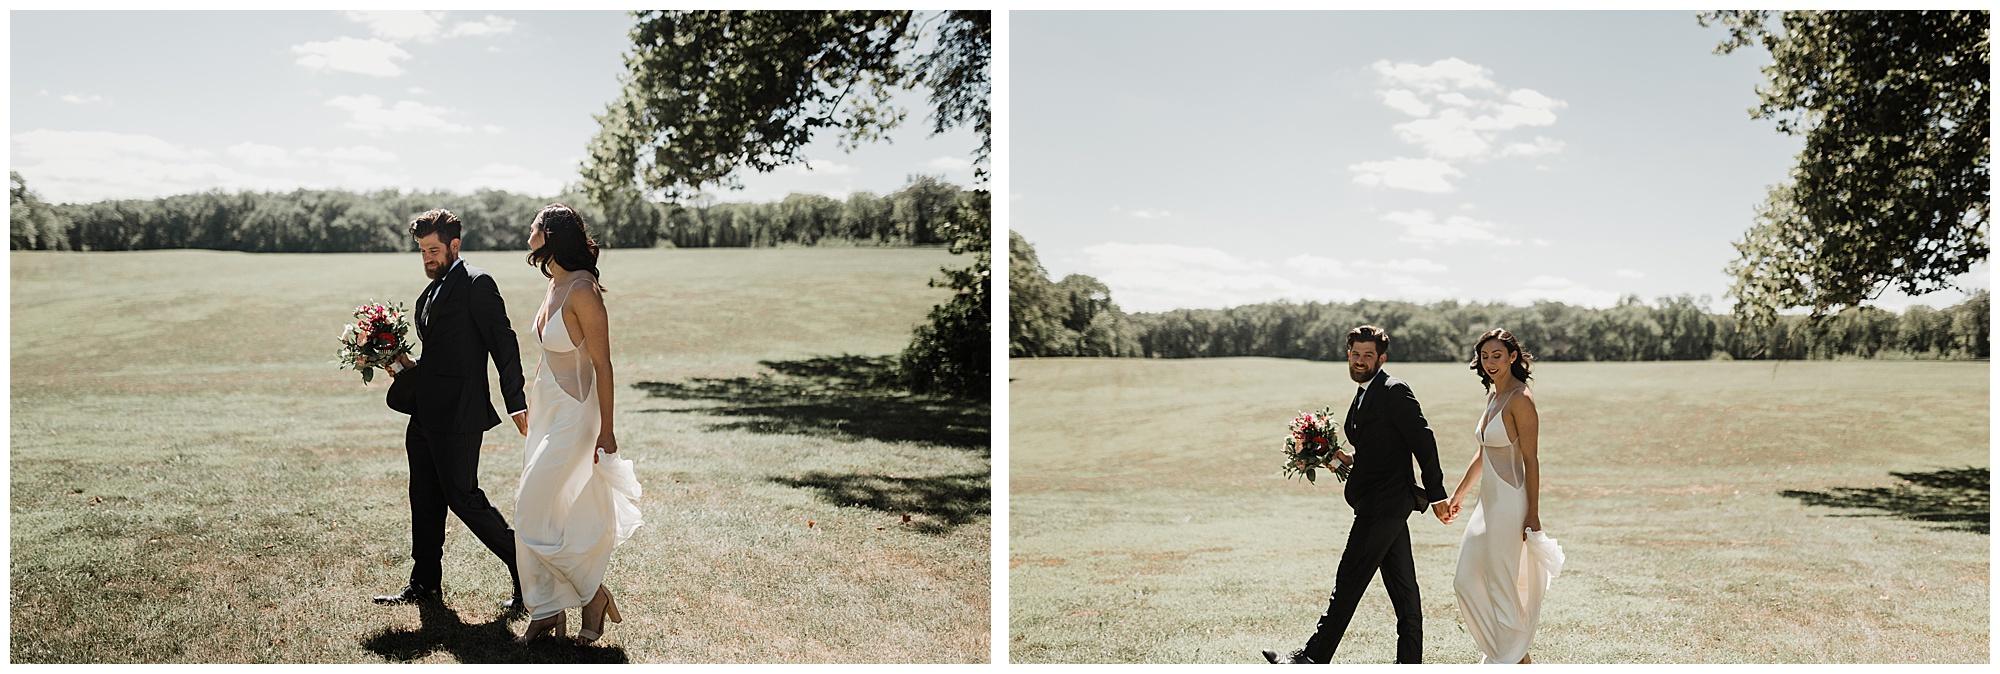 allerton_park_wedding_champaign_il_chicago_wright_photographs_ne_0015.jpg